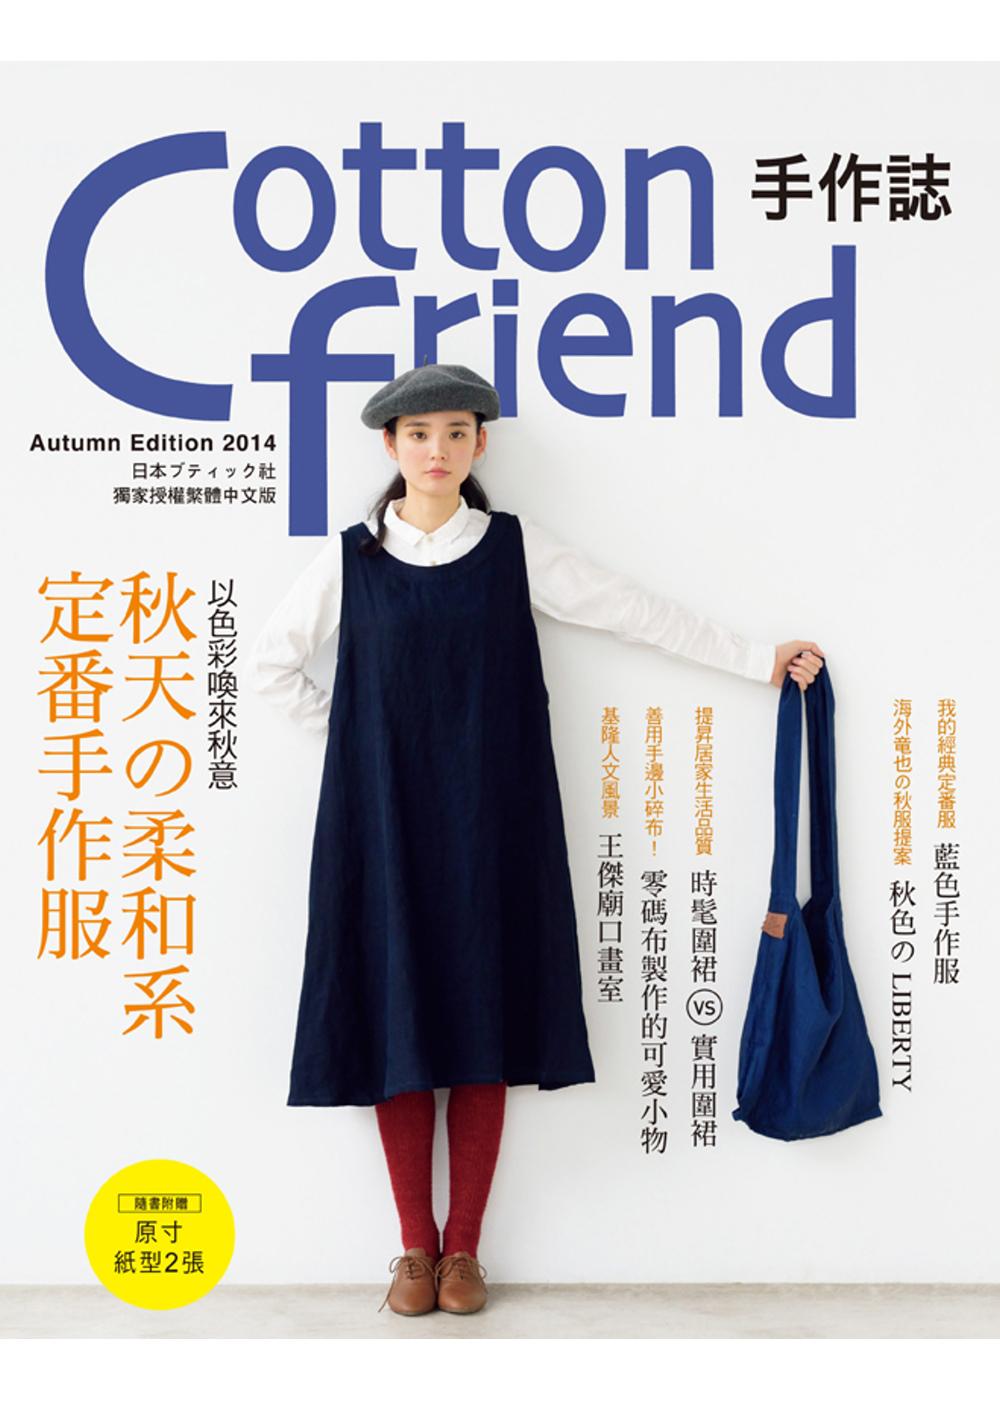 Cotton friend 手作誌26:以色彩喚來秋意‧秋天の柔和系定番手作服